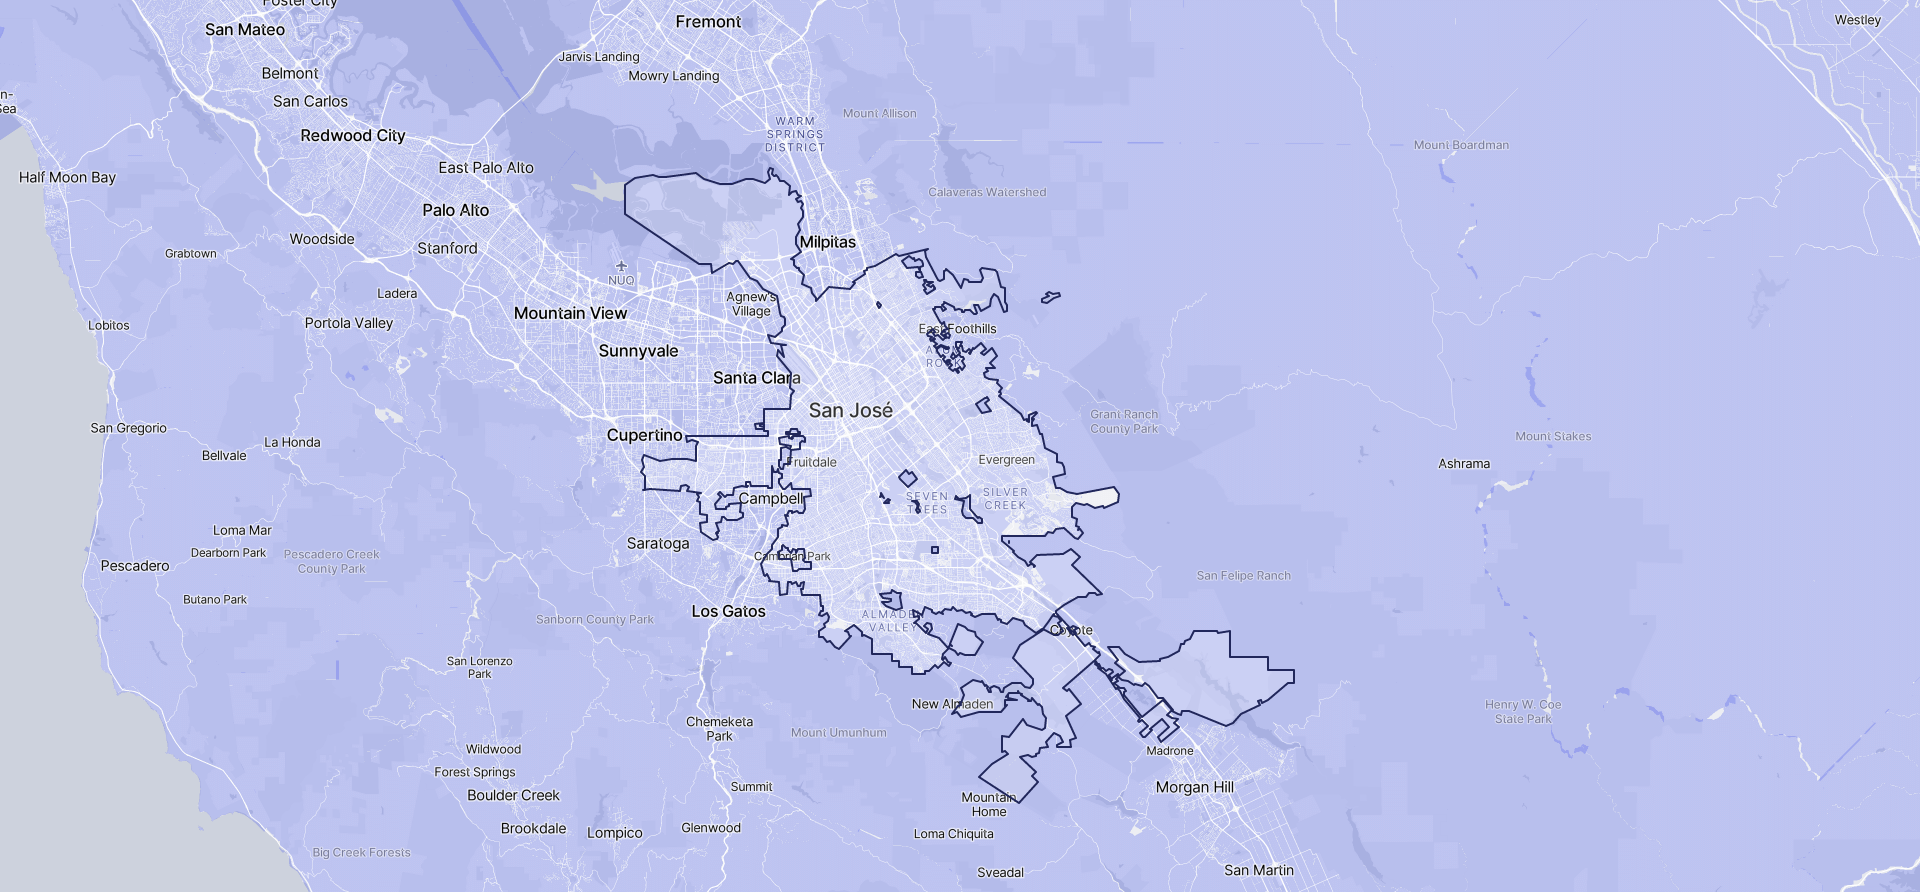 Image of San Jose boundaries on a map.